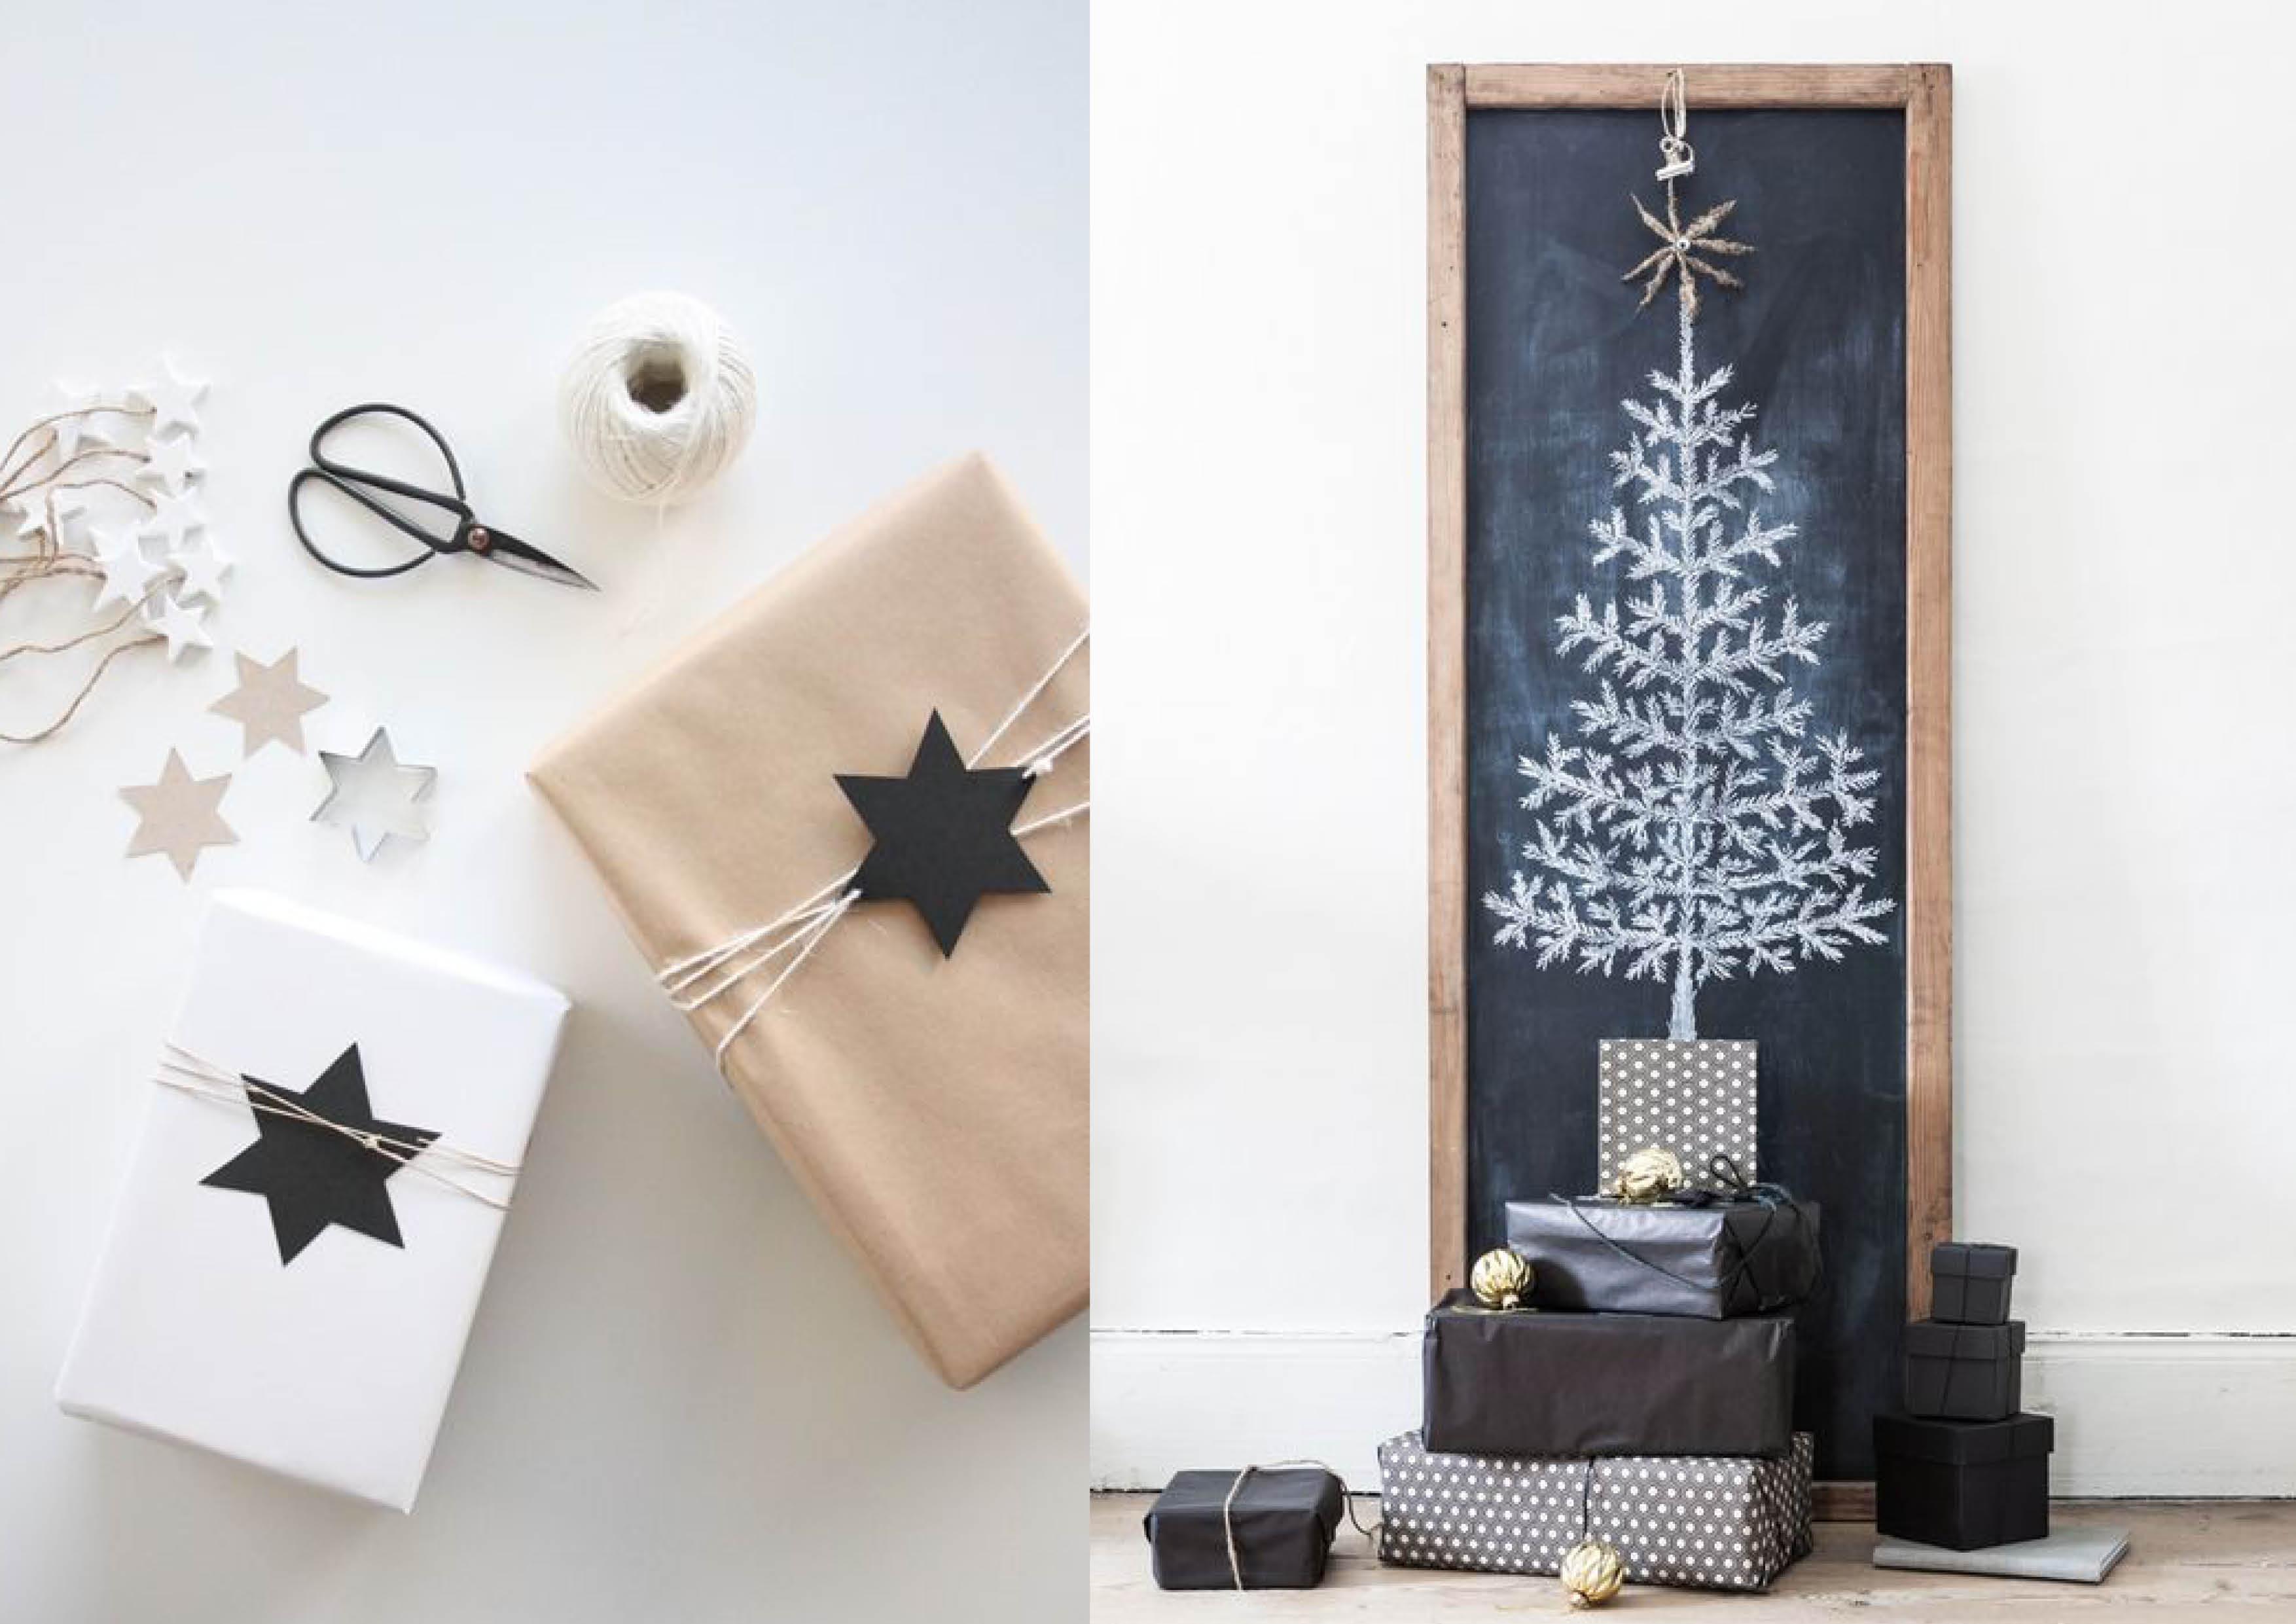 100 Sweet-Home-Weihnachtsgeschenke: Teil II | Sweet Home